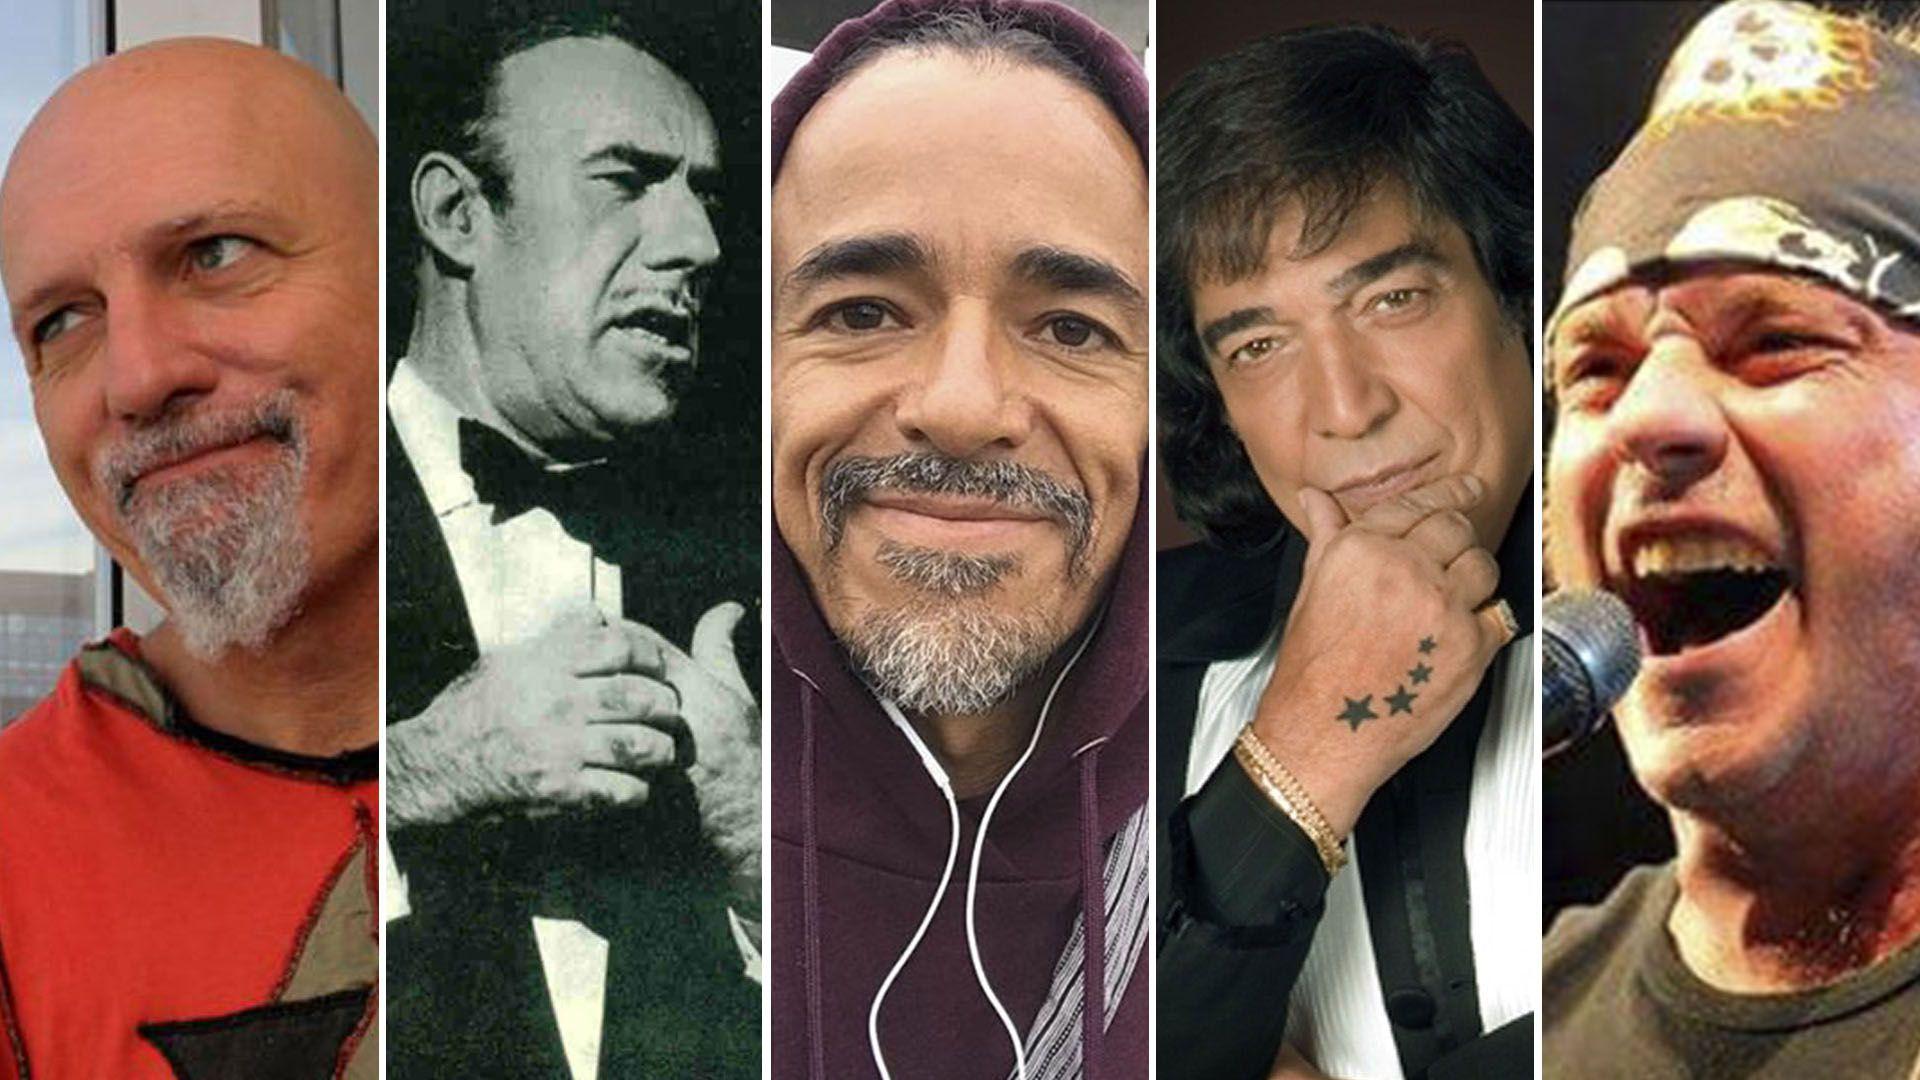 Gustavo Cordera, Edmundo Rivero, Rubén Albarrán, Cacho Castaña y Gustavo Nápoli, de La Renga